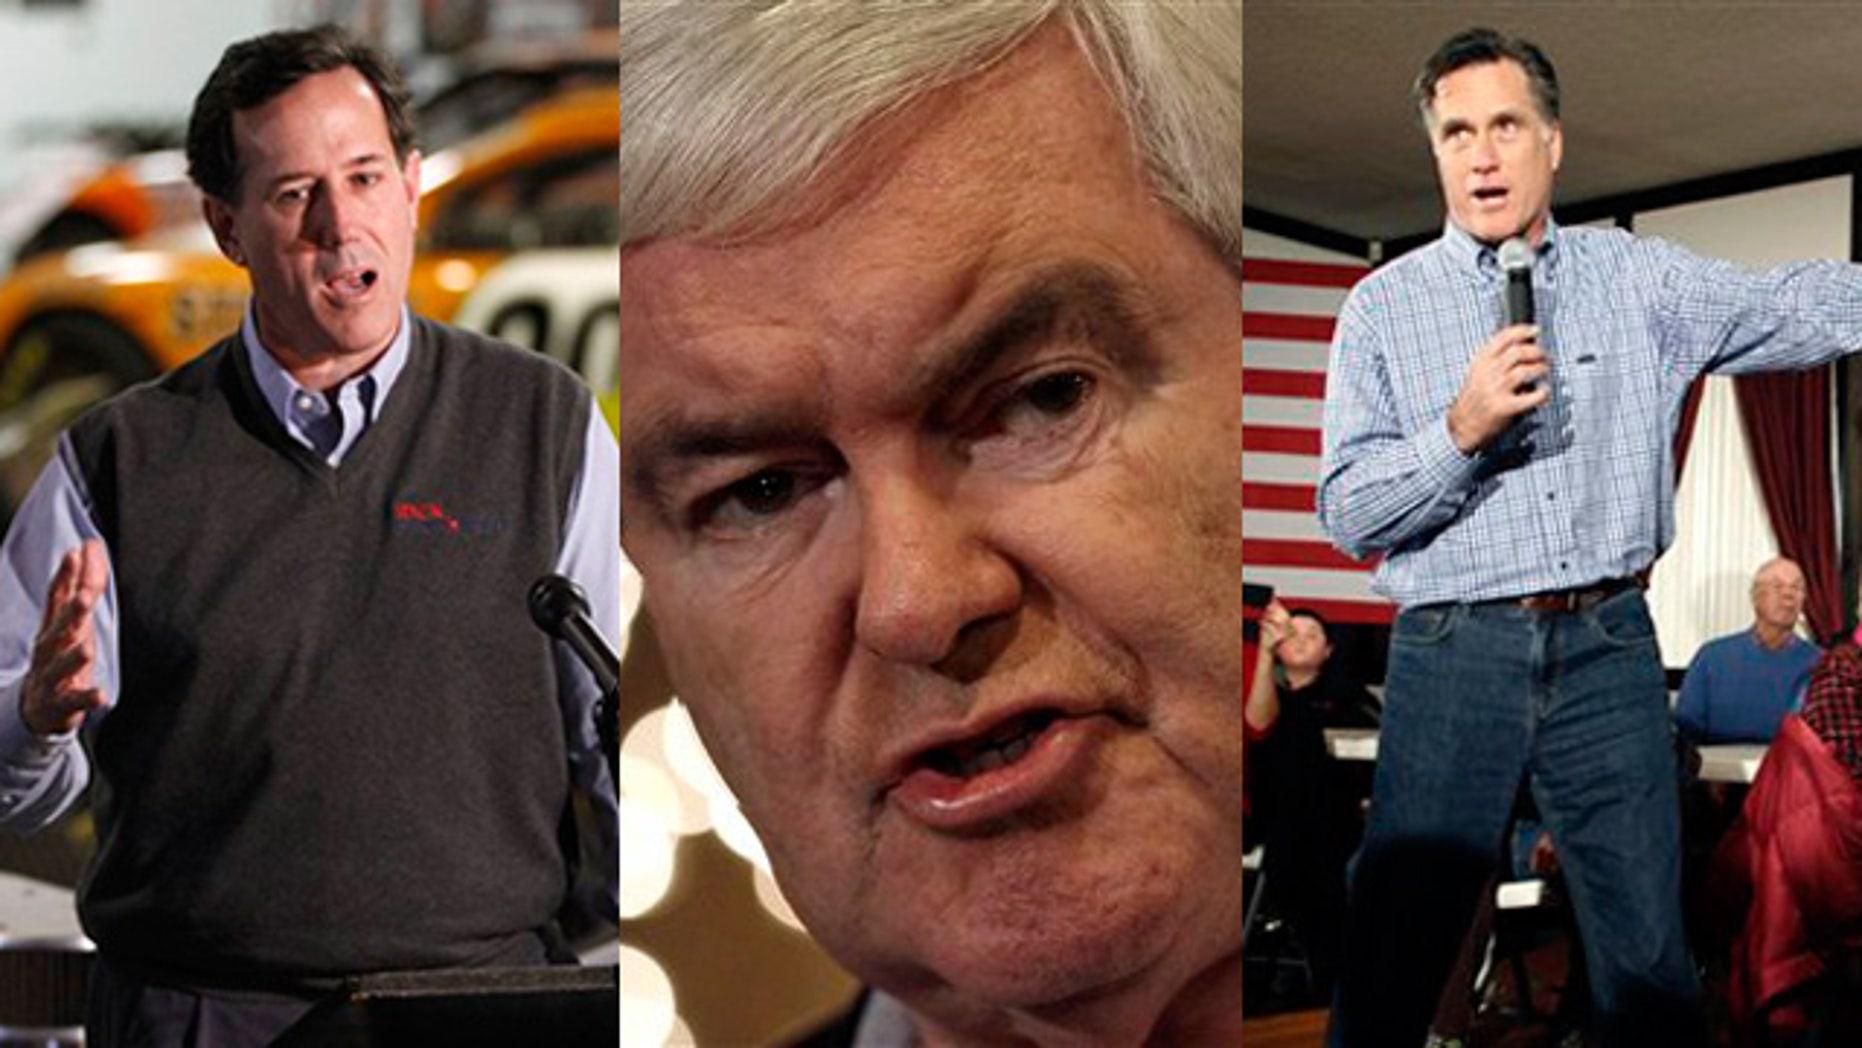 Shown here are Rick Santorum, left, Newt Gingrich, center, and Mitt Romney.